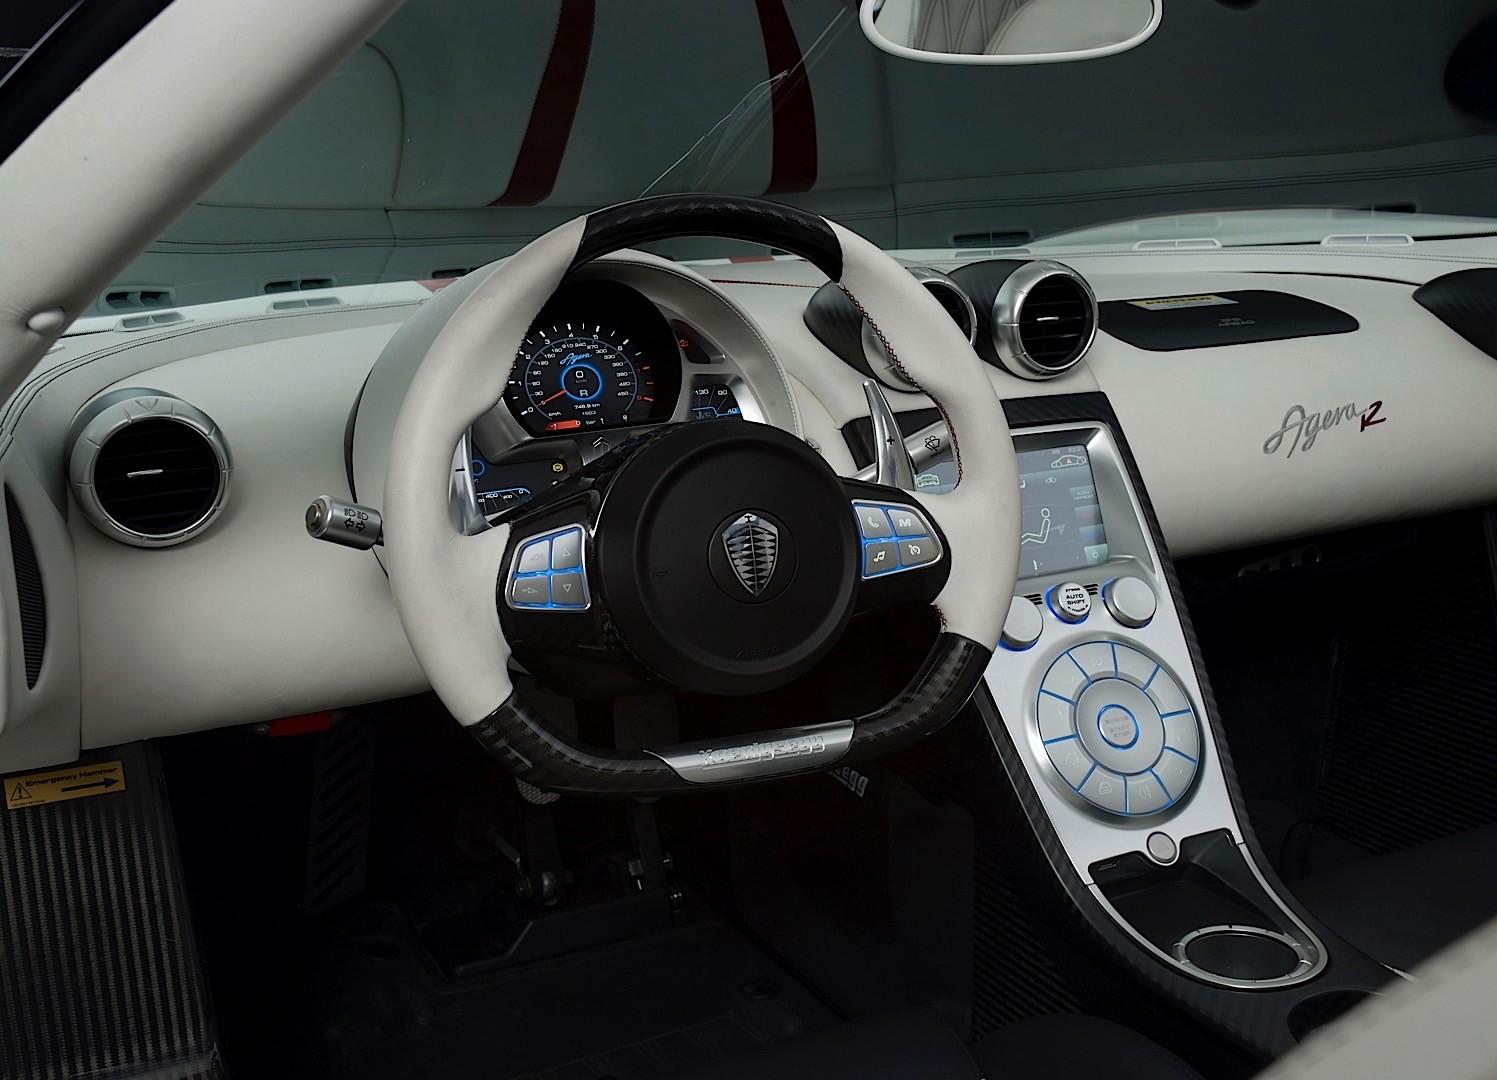 Koenigsegg koenigsegg agera r interior : KOENIGSEGG Agera R specs - 2011, 2012, 2013, 2014 - autoevolution